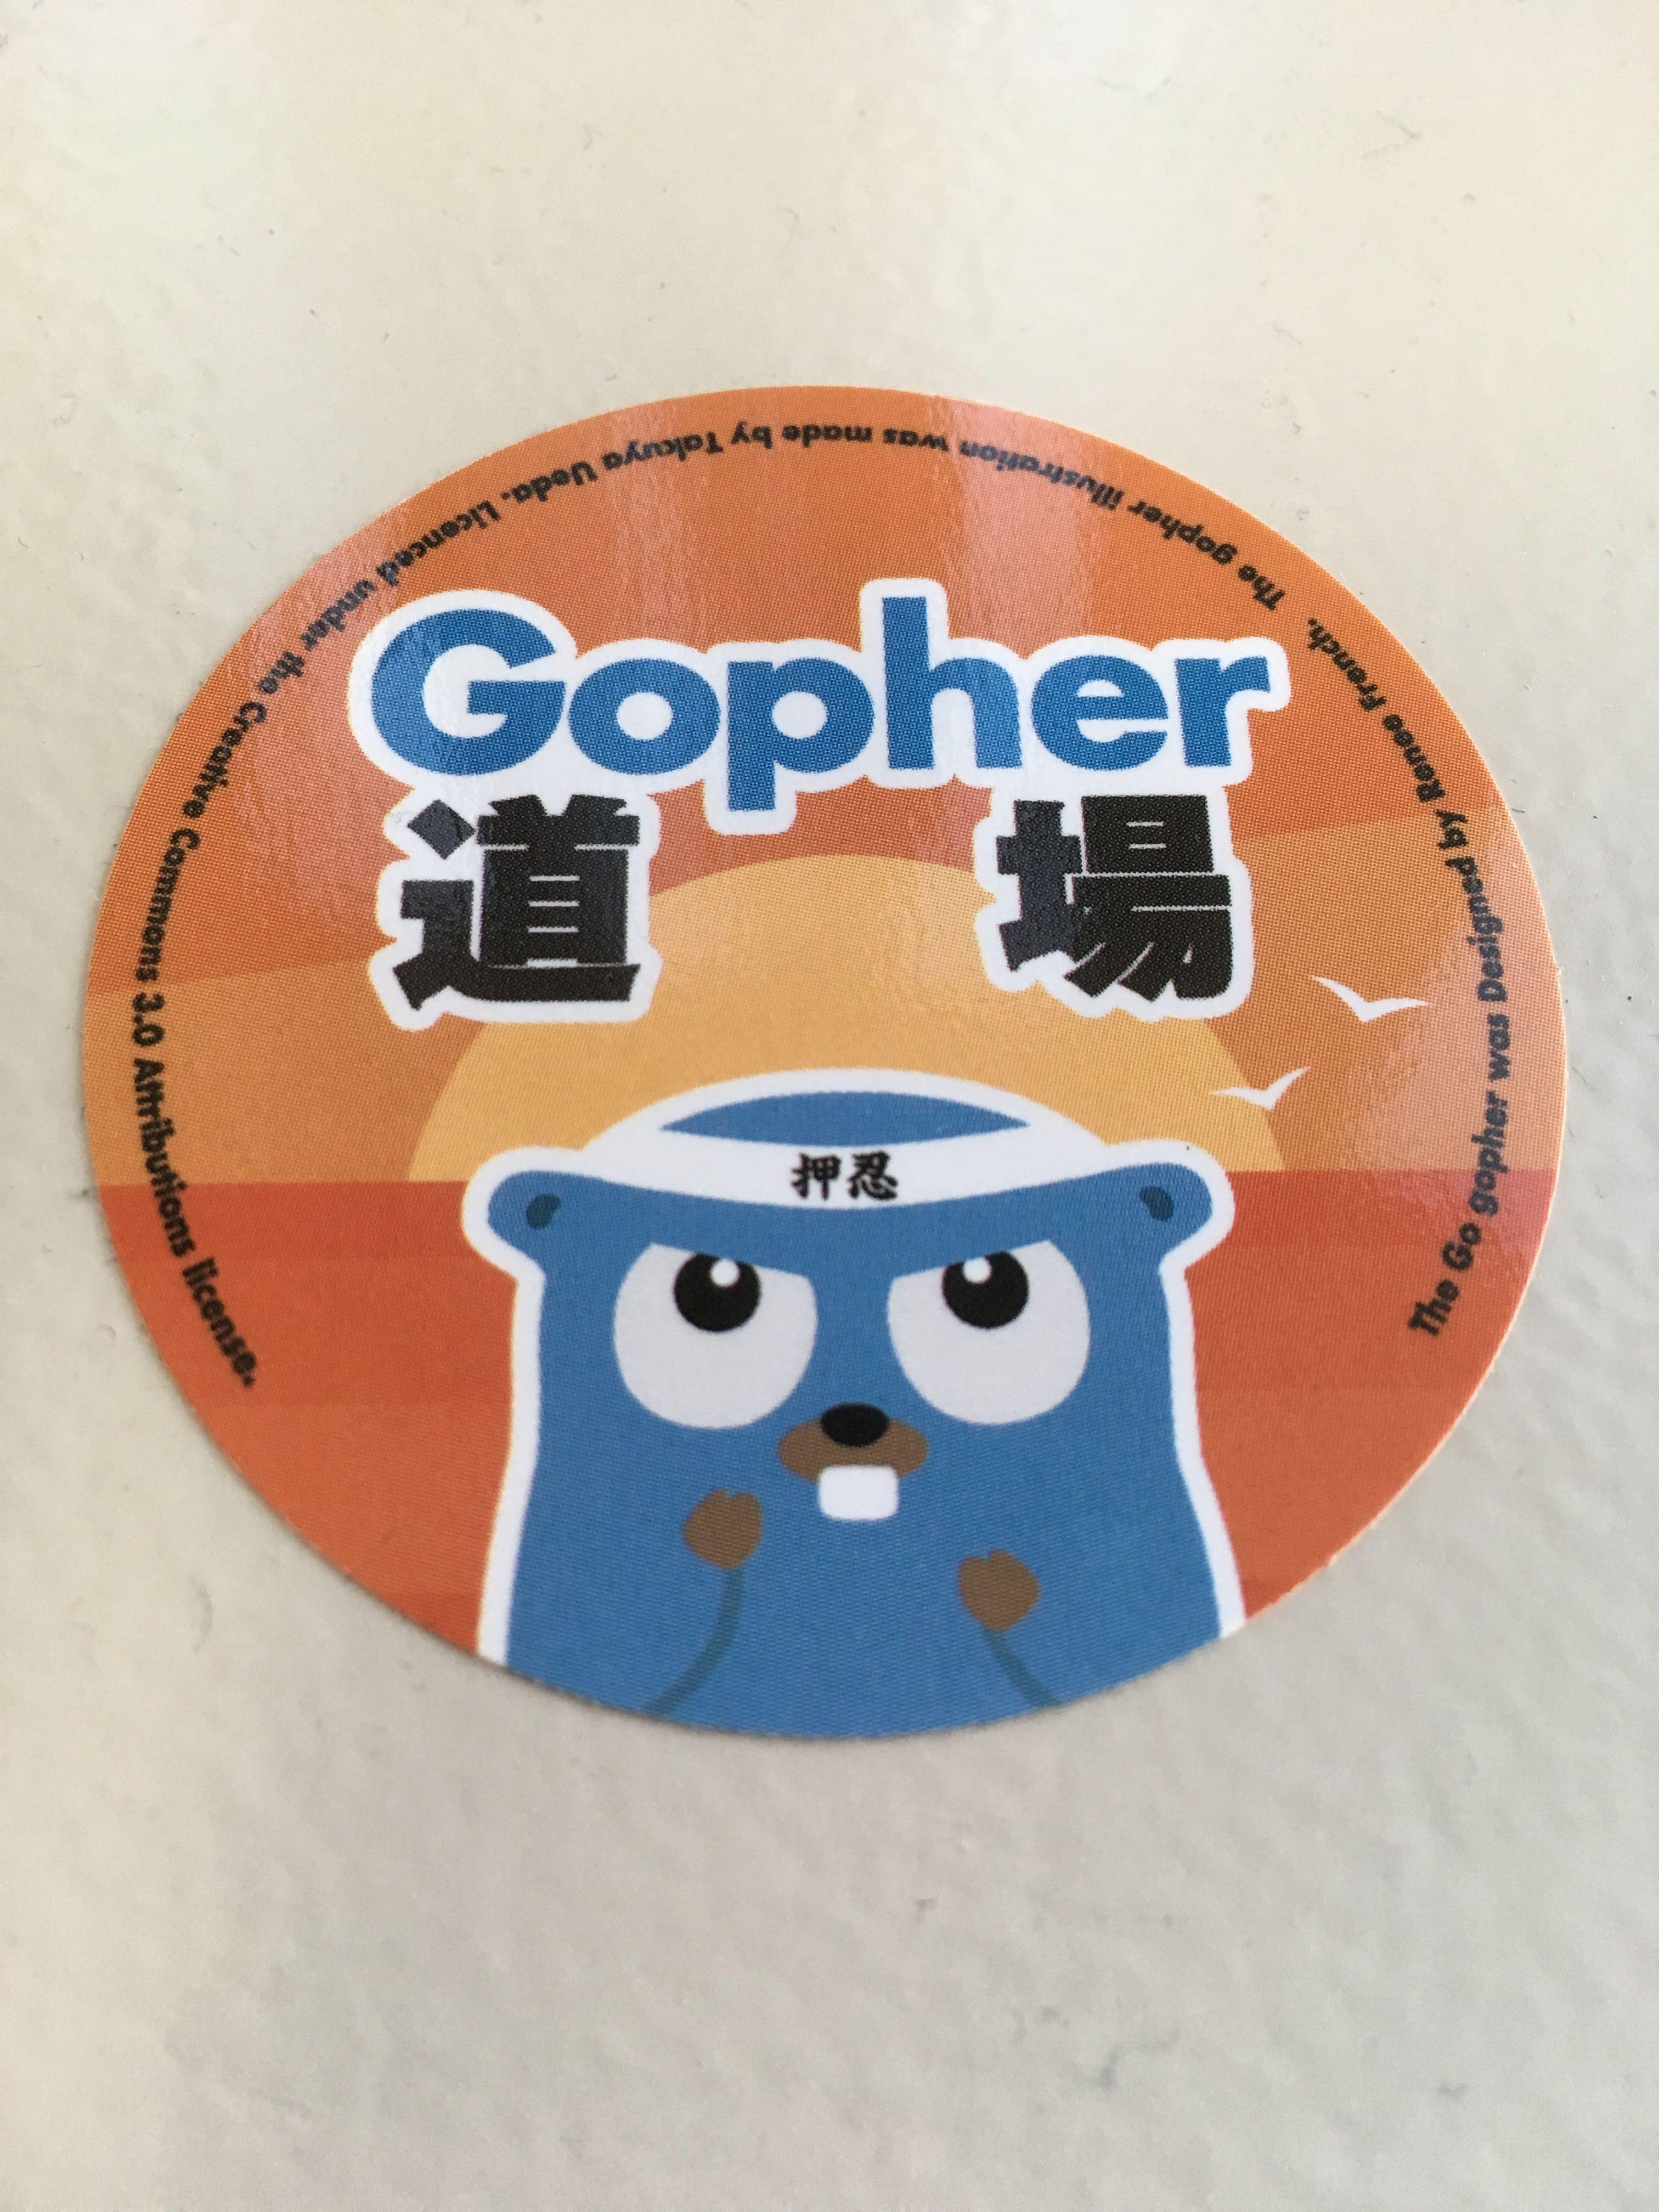 https://contents.blog.jicoman.info/2018/05/gopher_dojo_seal.jpg